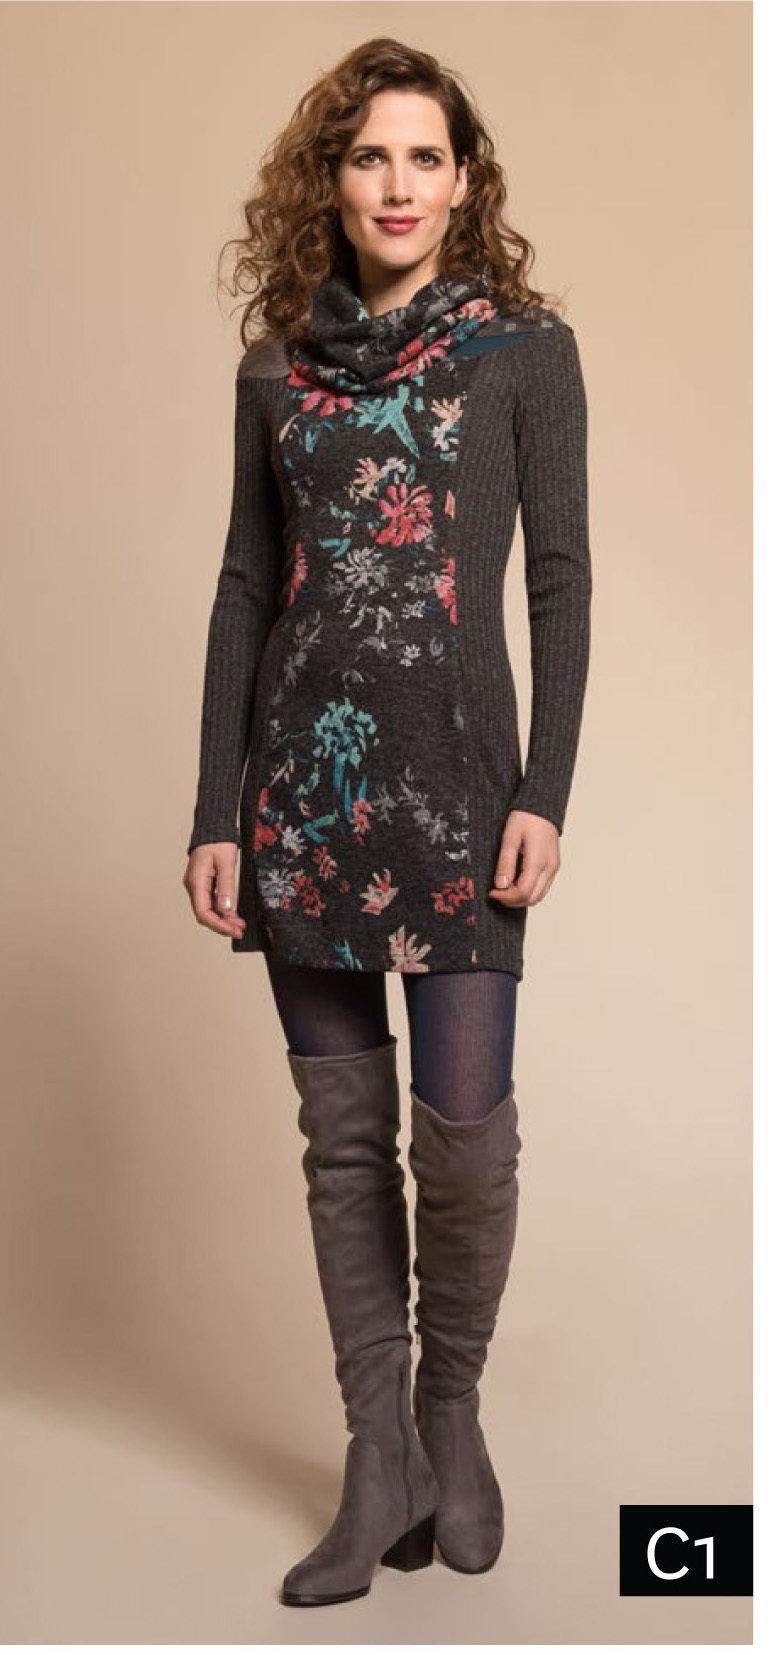 Myco Anna: Pink Jade Eco-Wear Asymmetrical Patchwork Sweater Dress